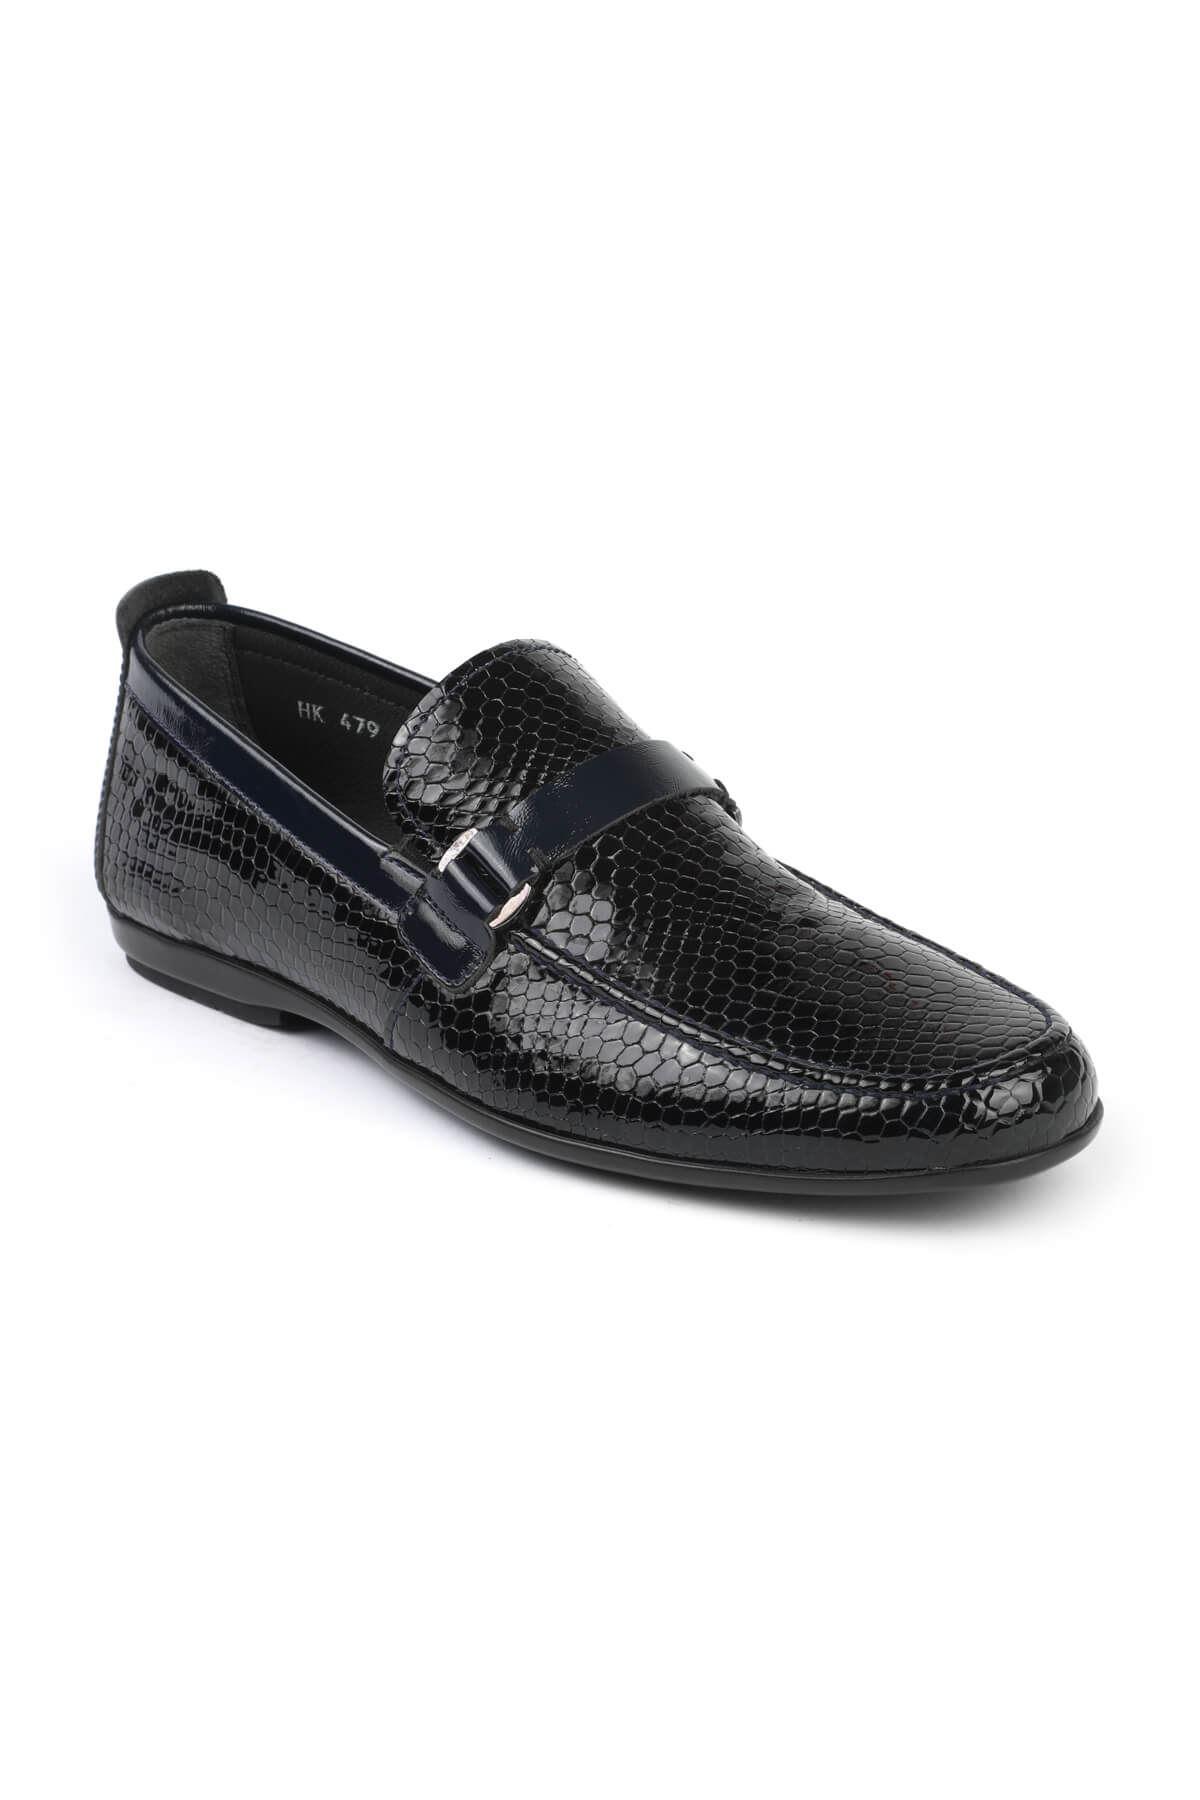 Libero C479 Lacivert Loafer Ayakkabı